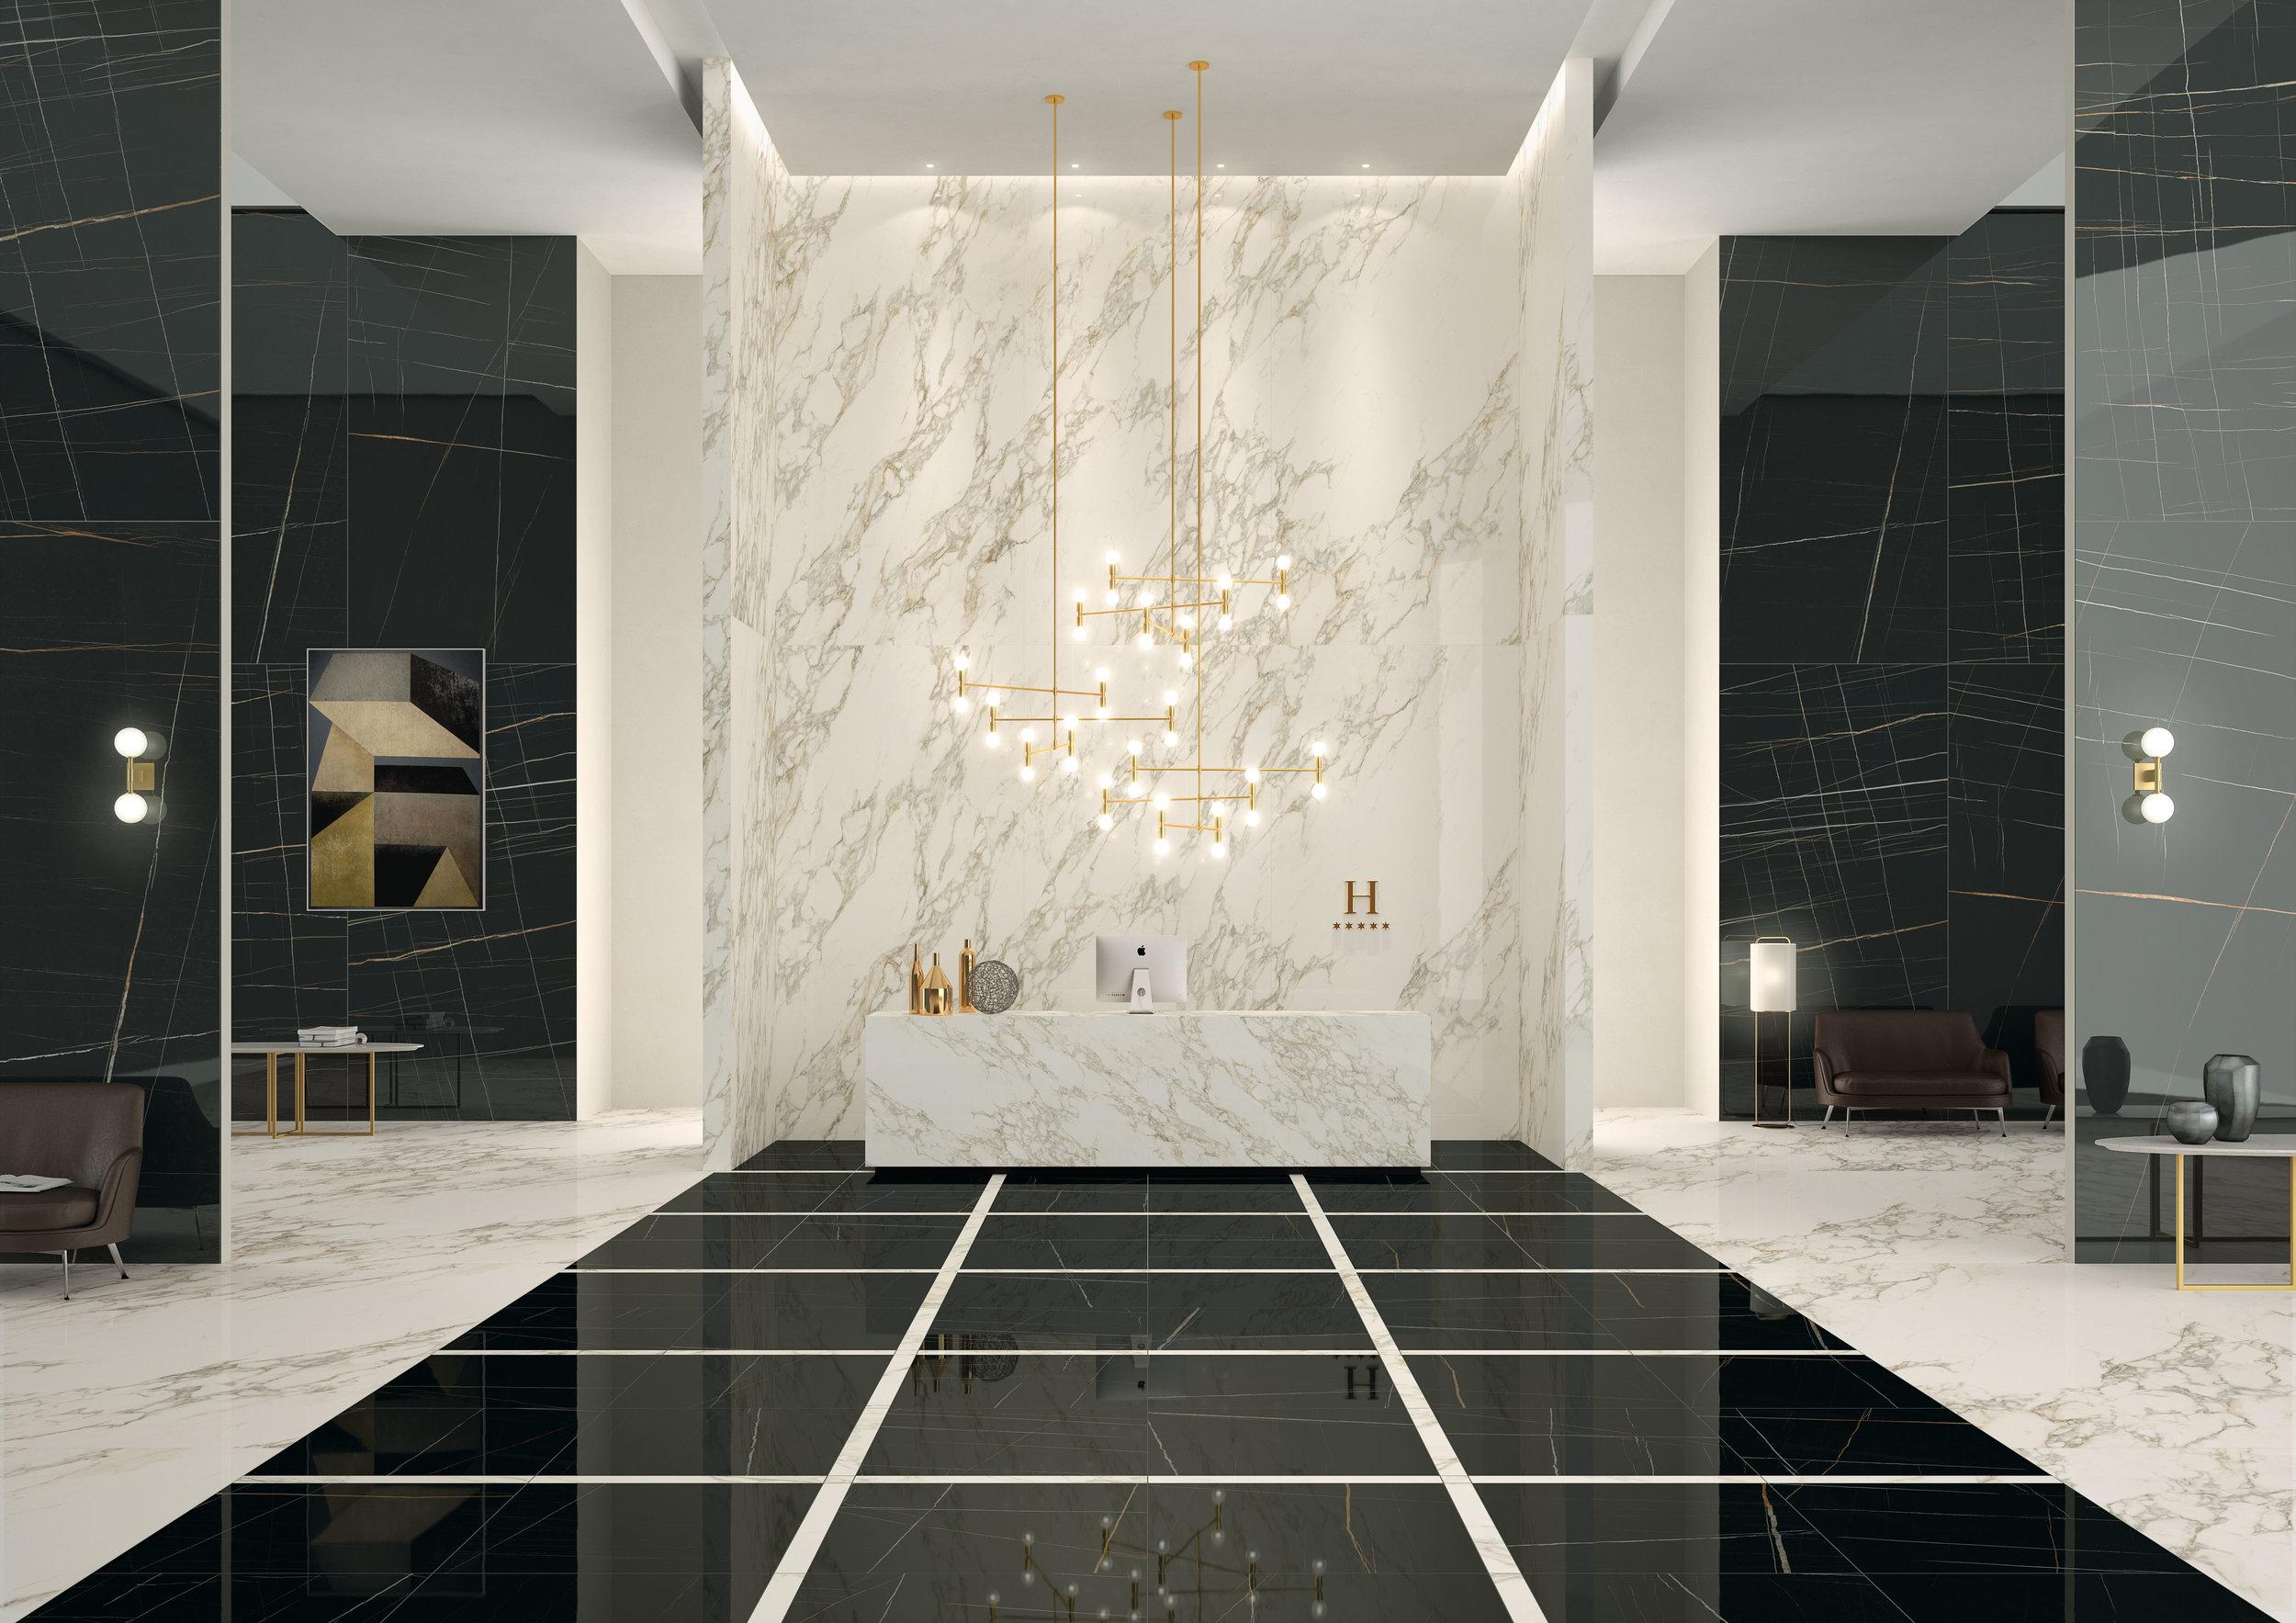 acquastone_Italgraniti_Marble Experience_01 Hall_Definitivo *01.jpg